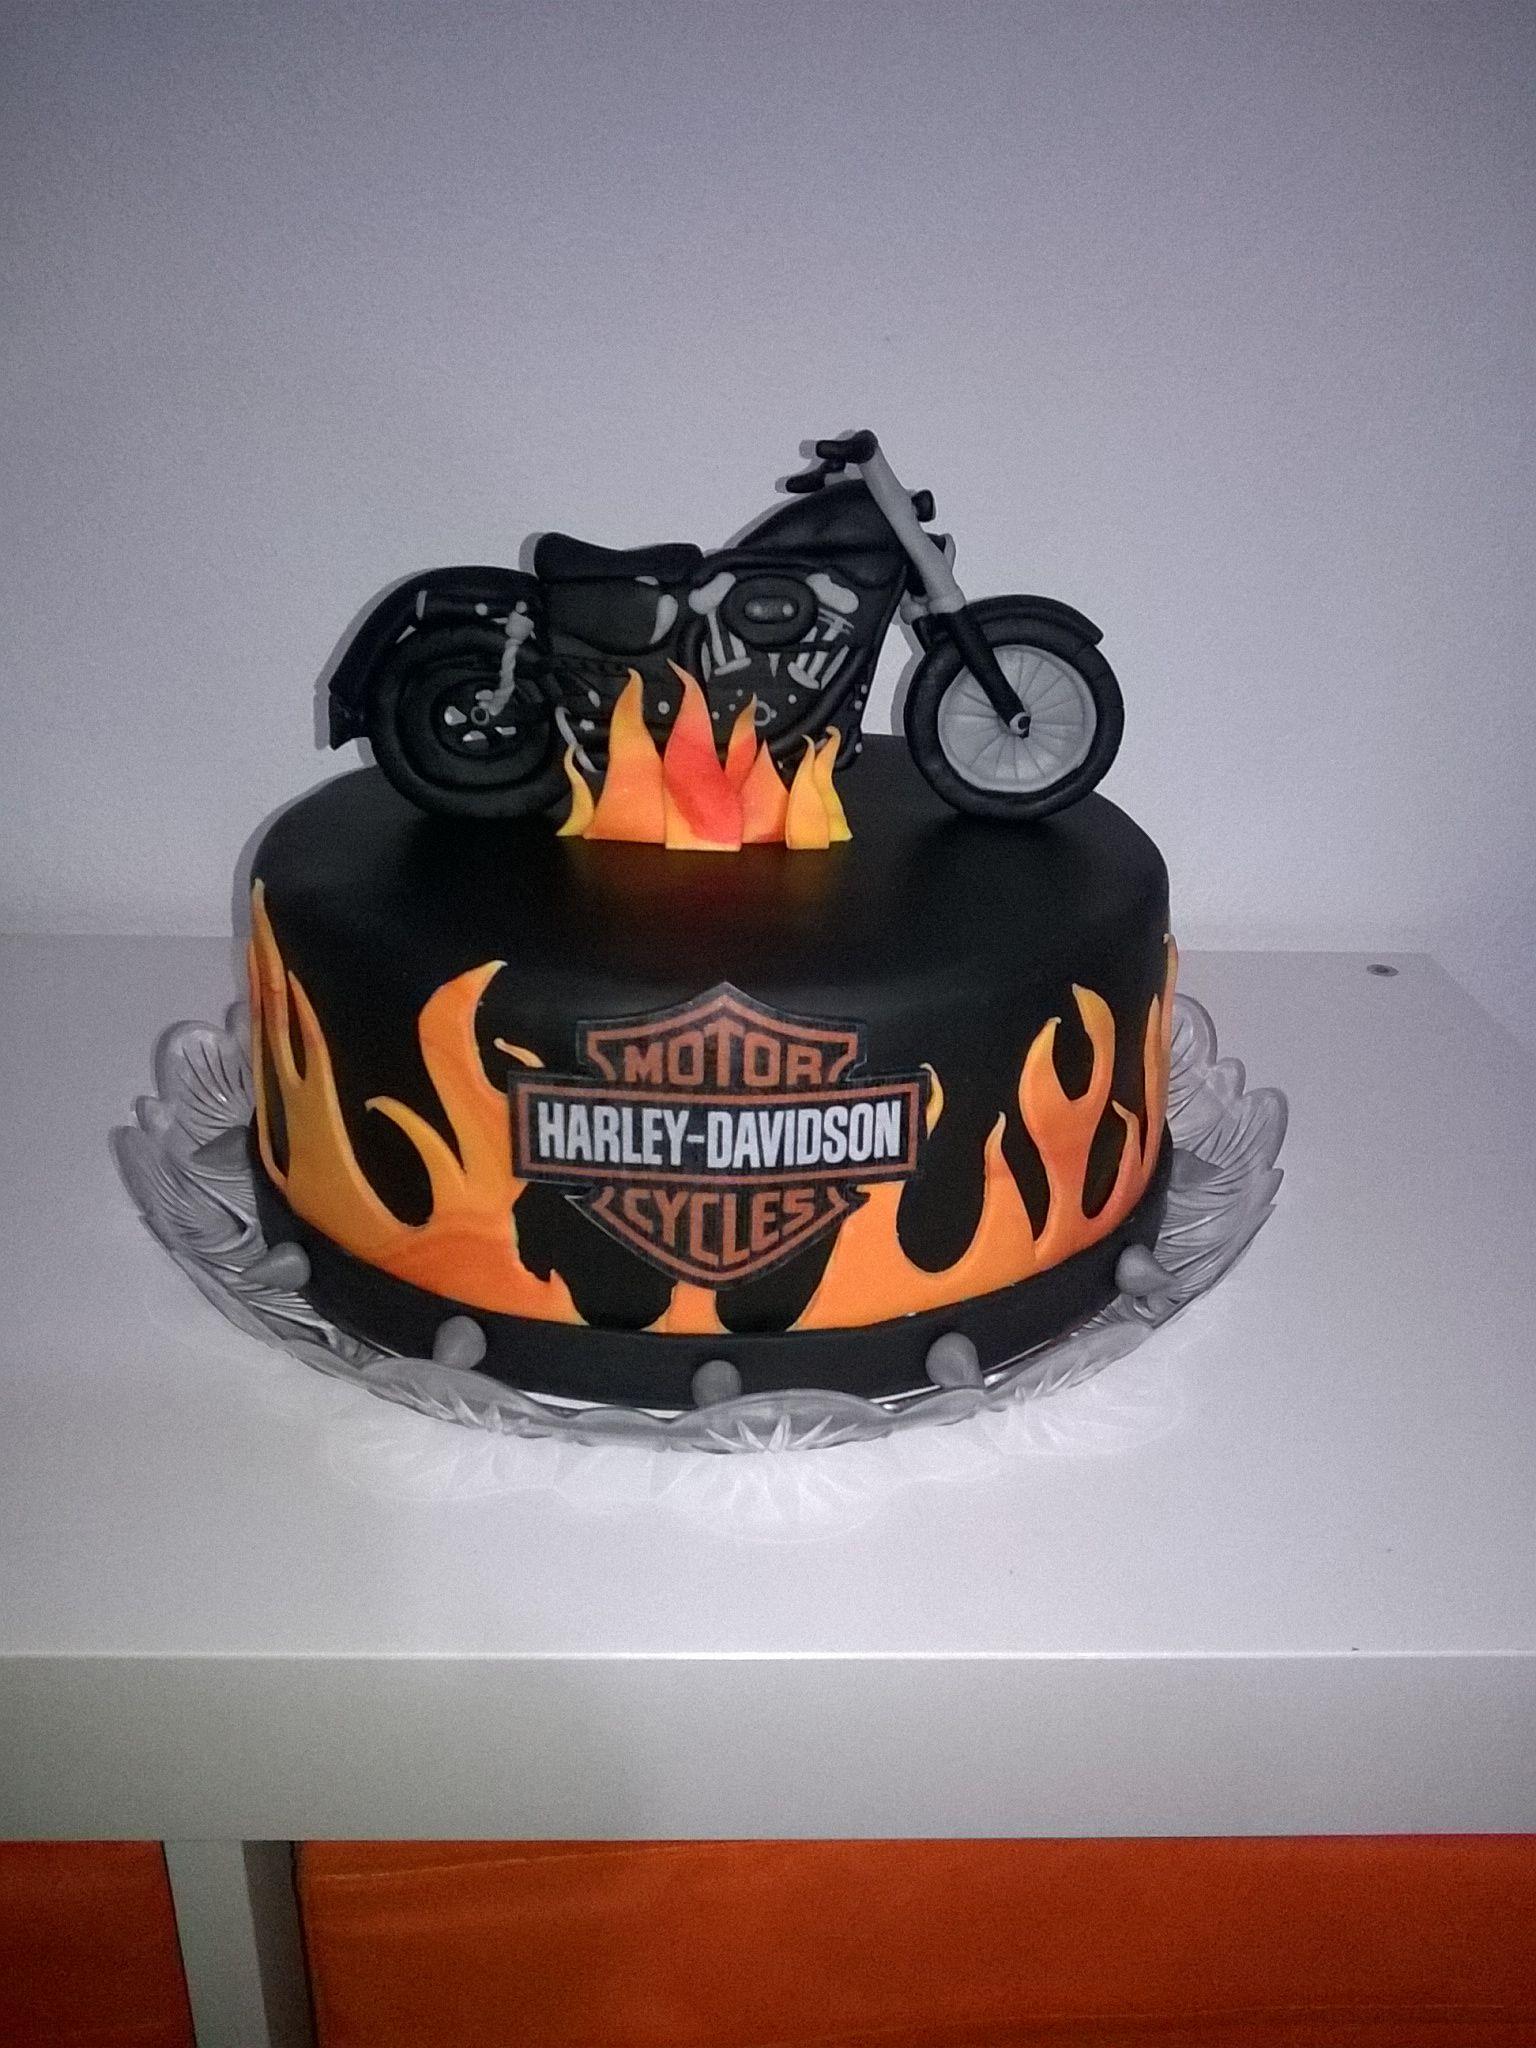 HarleyDavidson cake party Pinterest Harley davidson cake